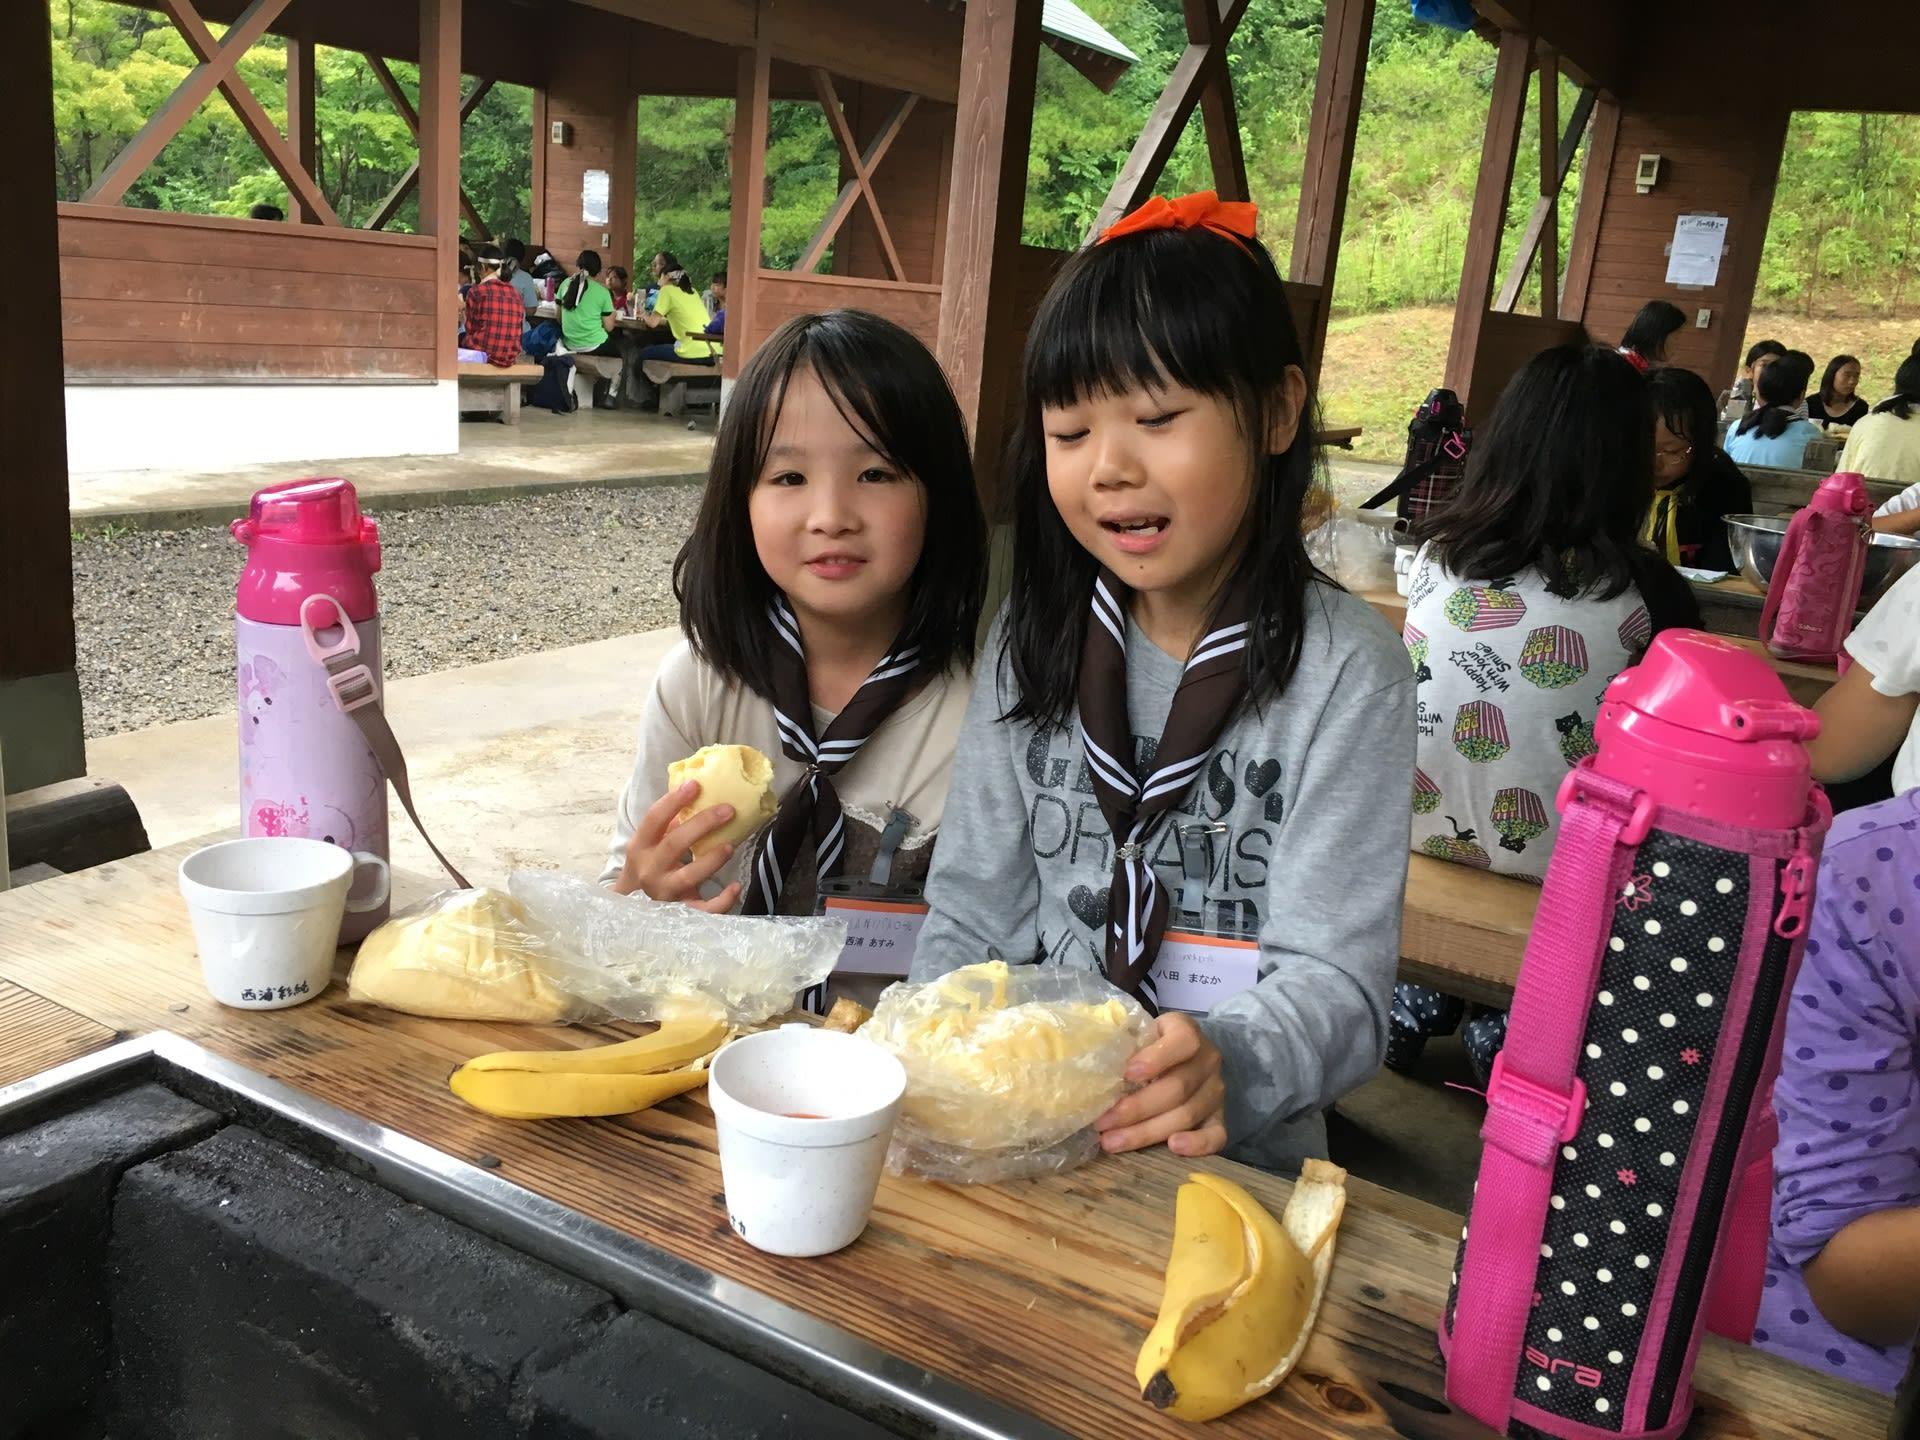 c51ad1e265851e46adb792de58a5ea41 2016 県キャンプを開催しました